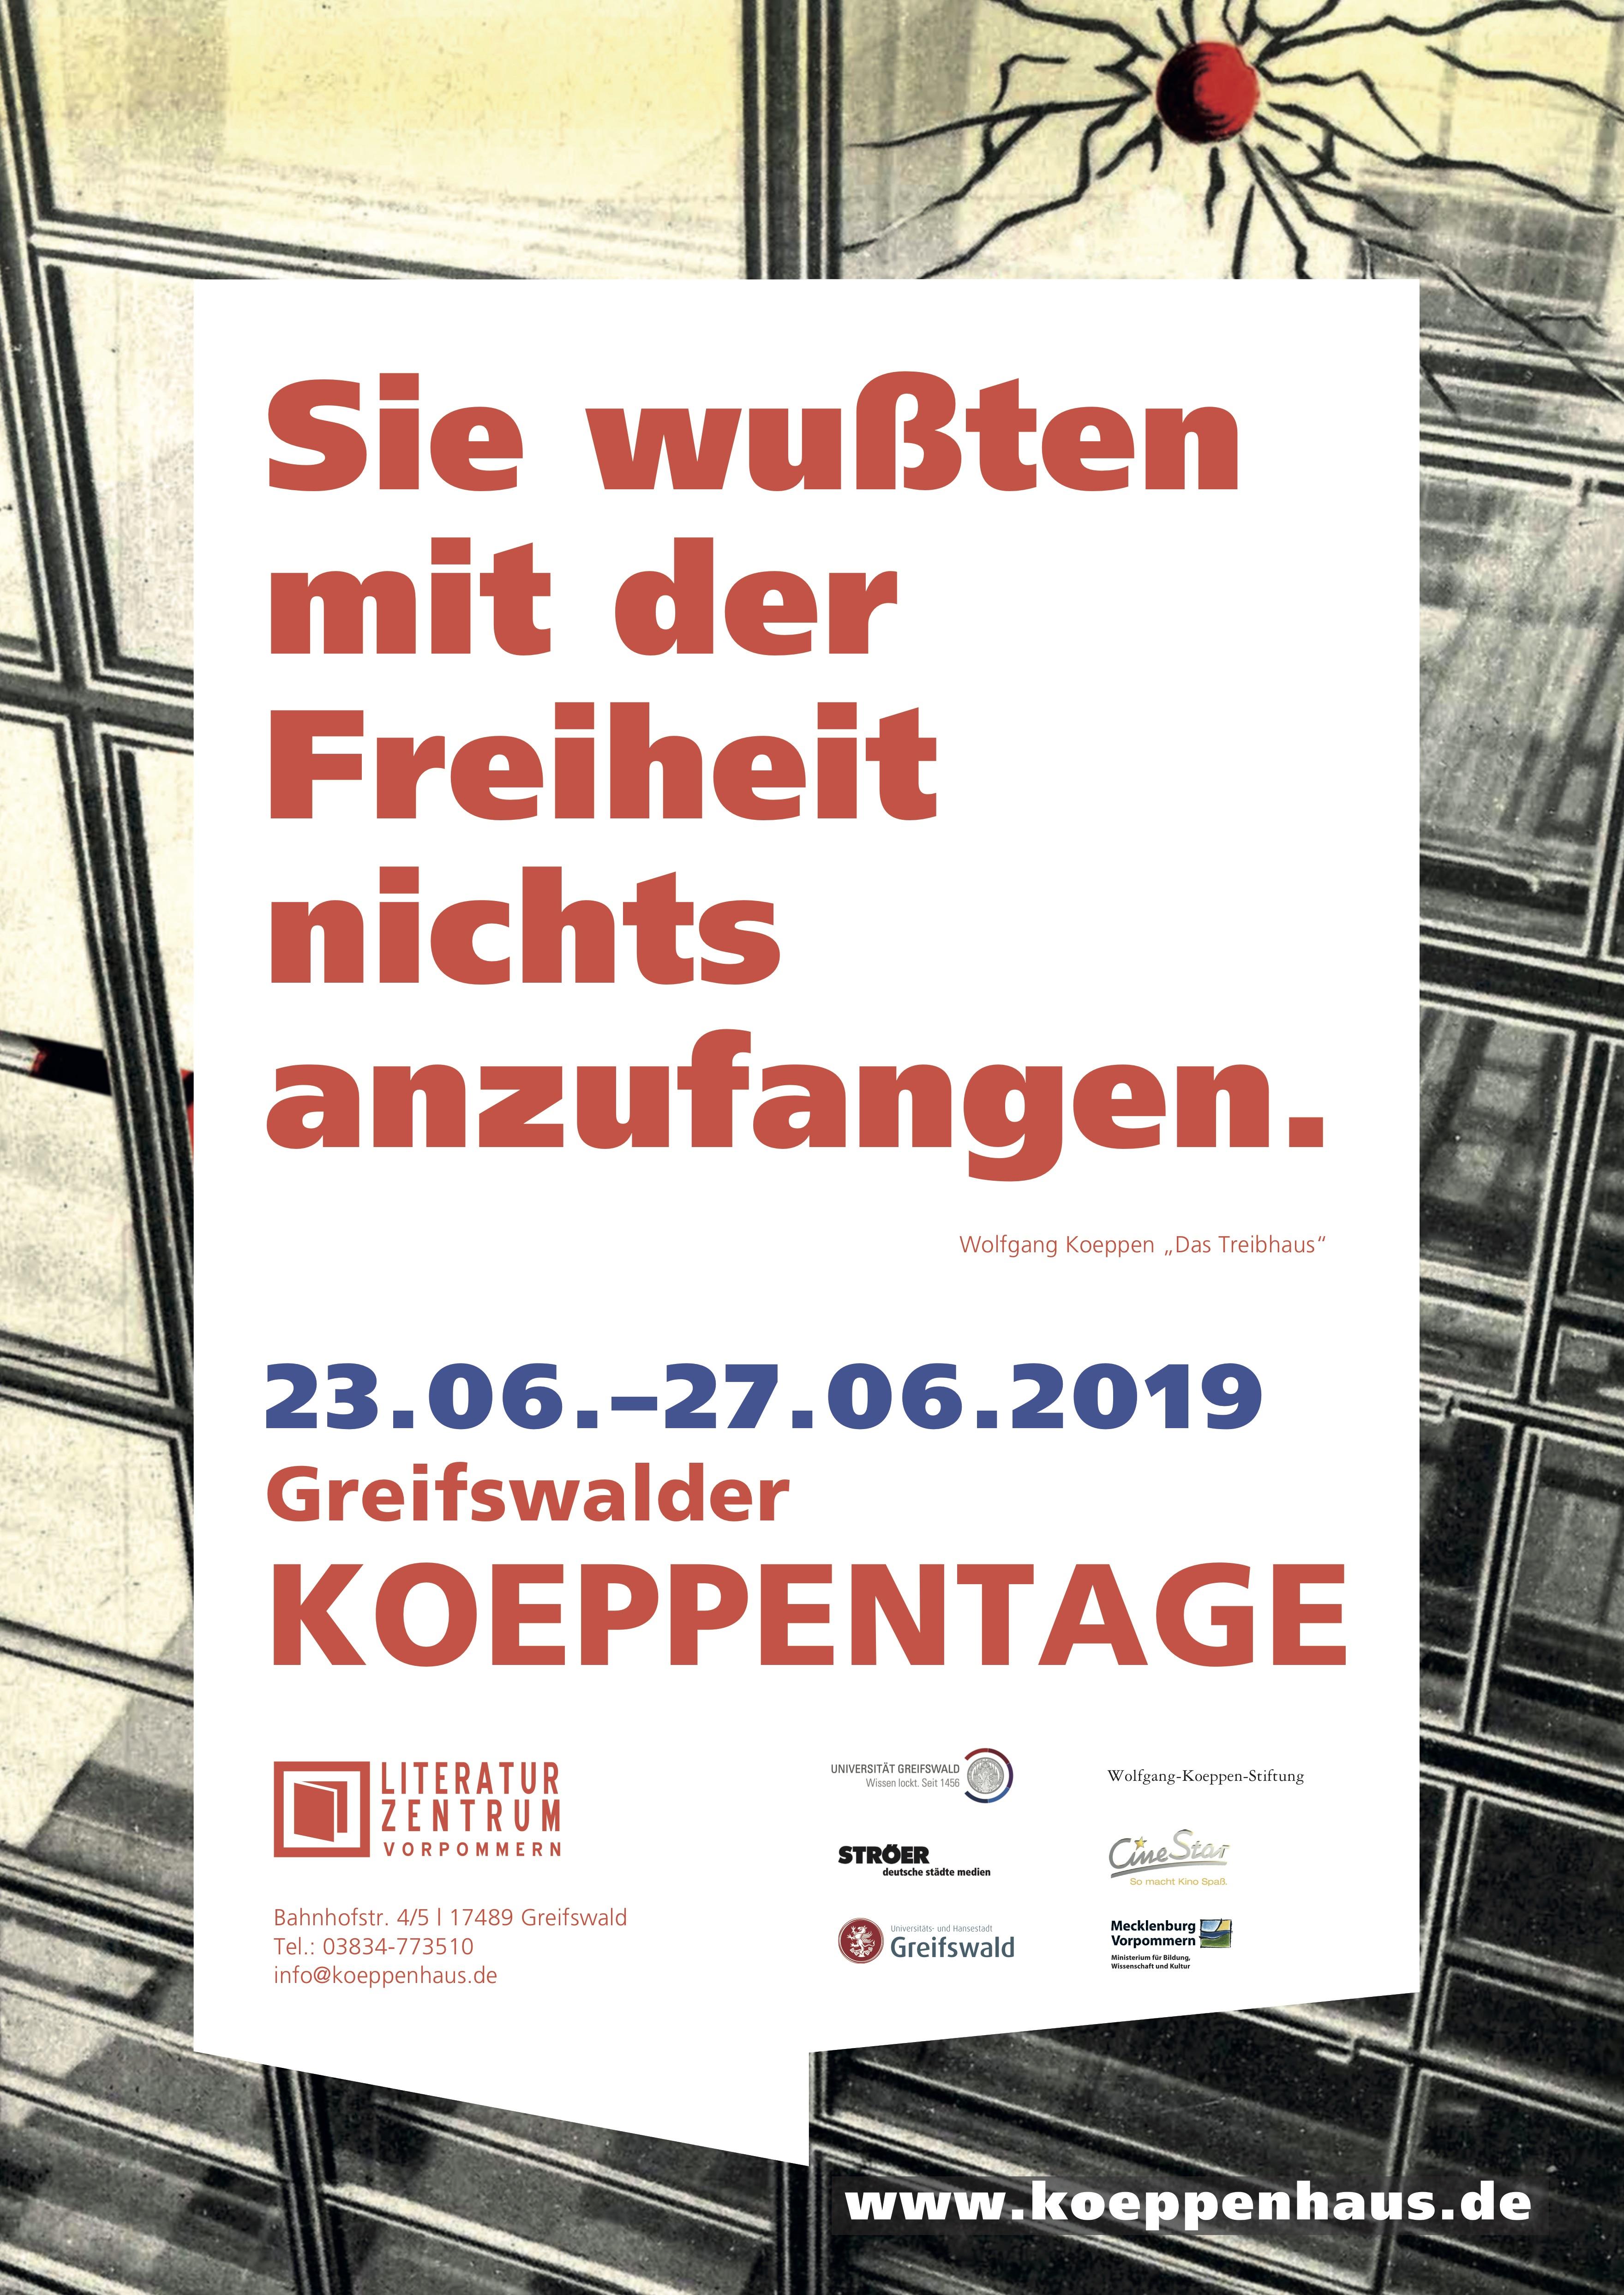 Koeppenhaus Greifswalder Koeppentage 2019